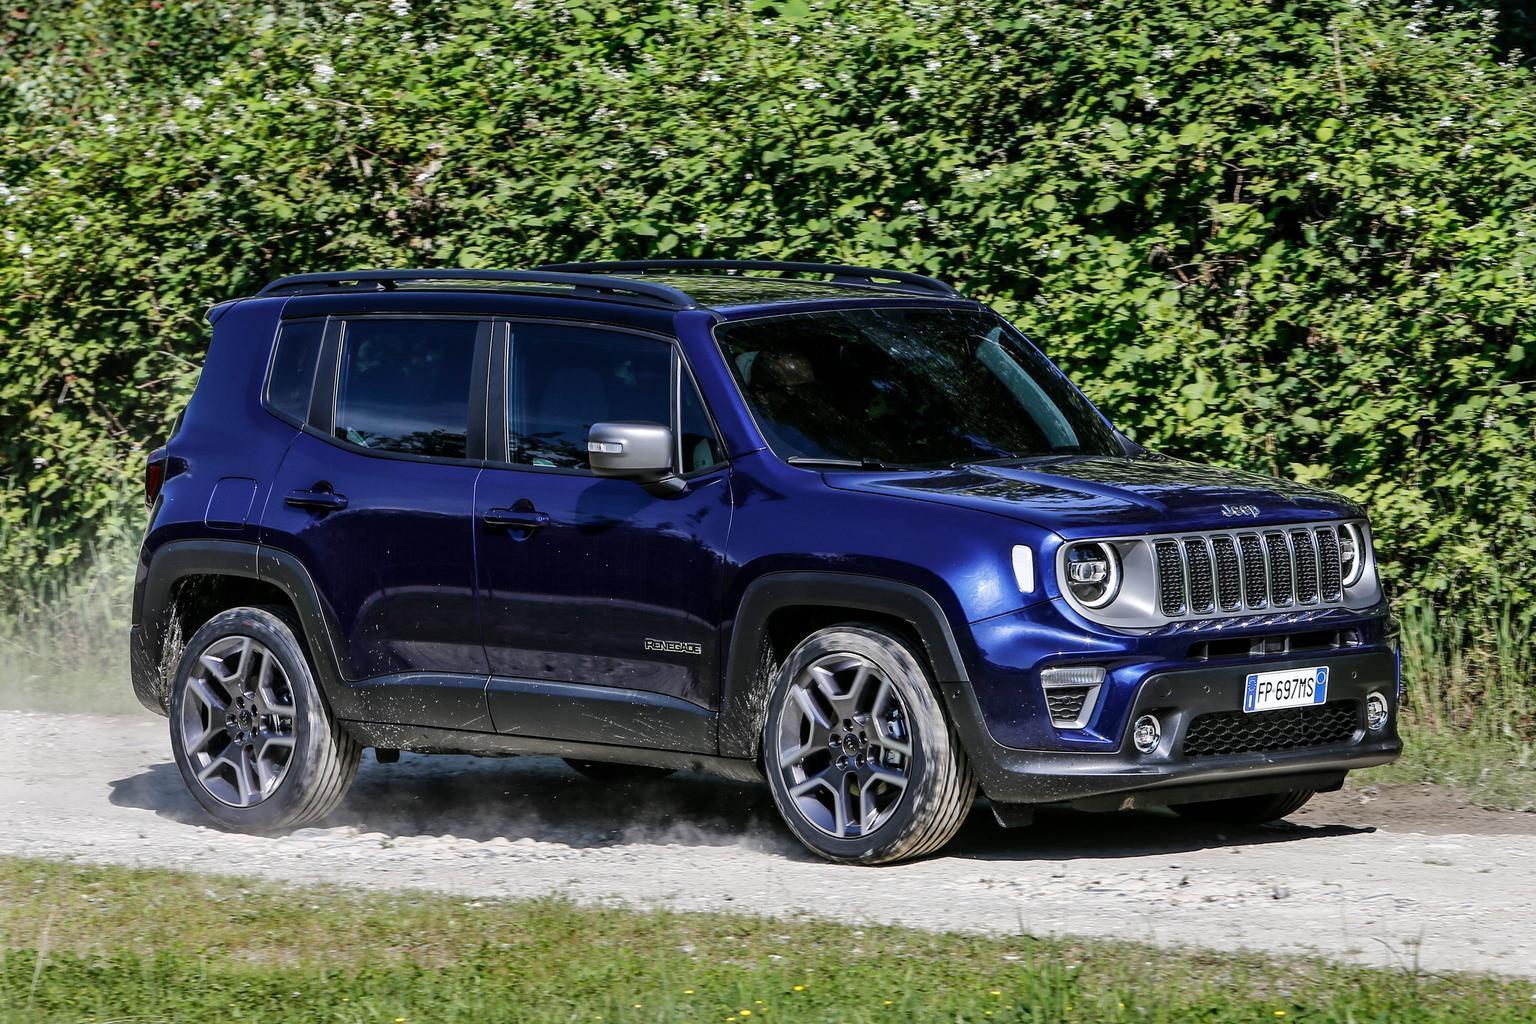 2018 Jeep Renegade - verdict